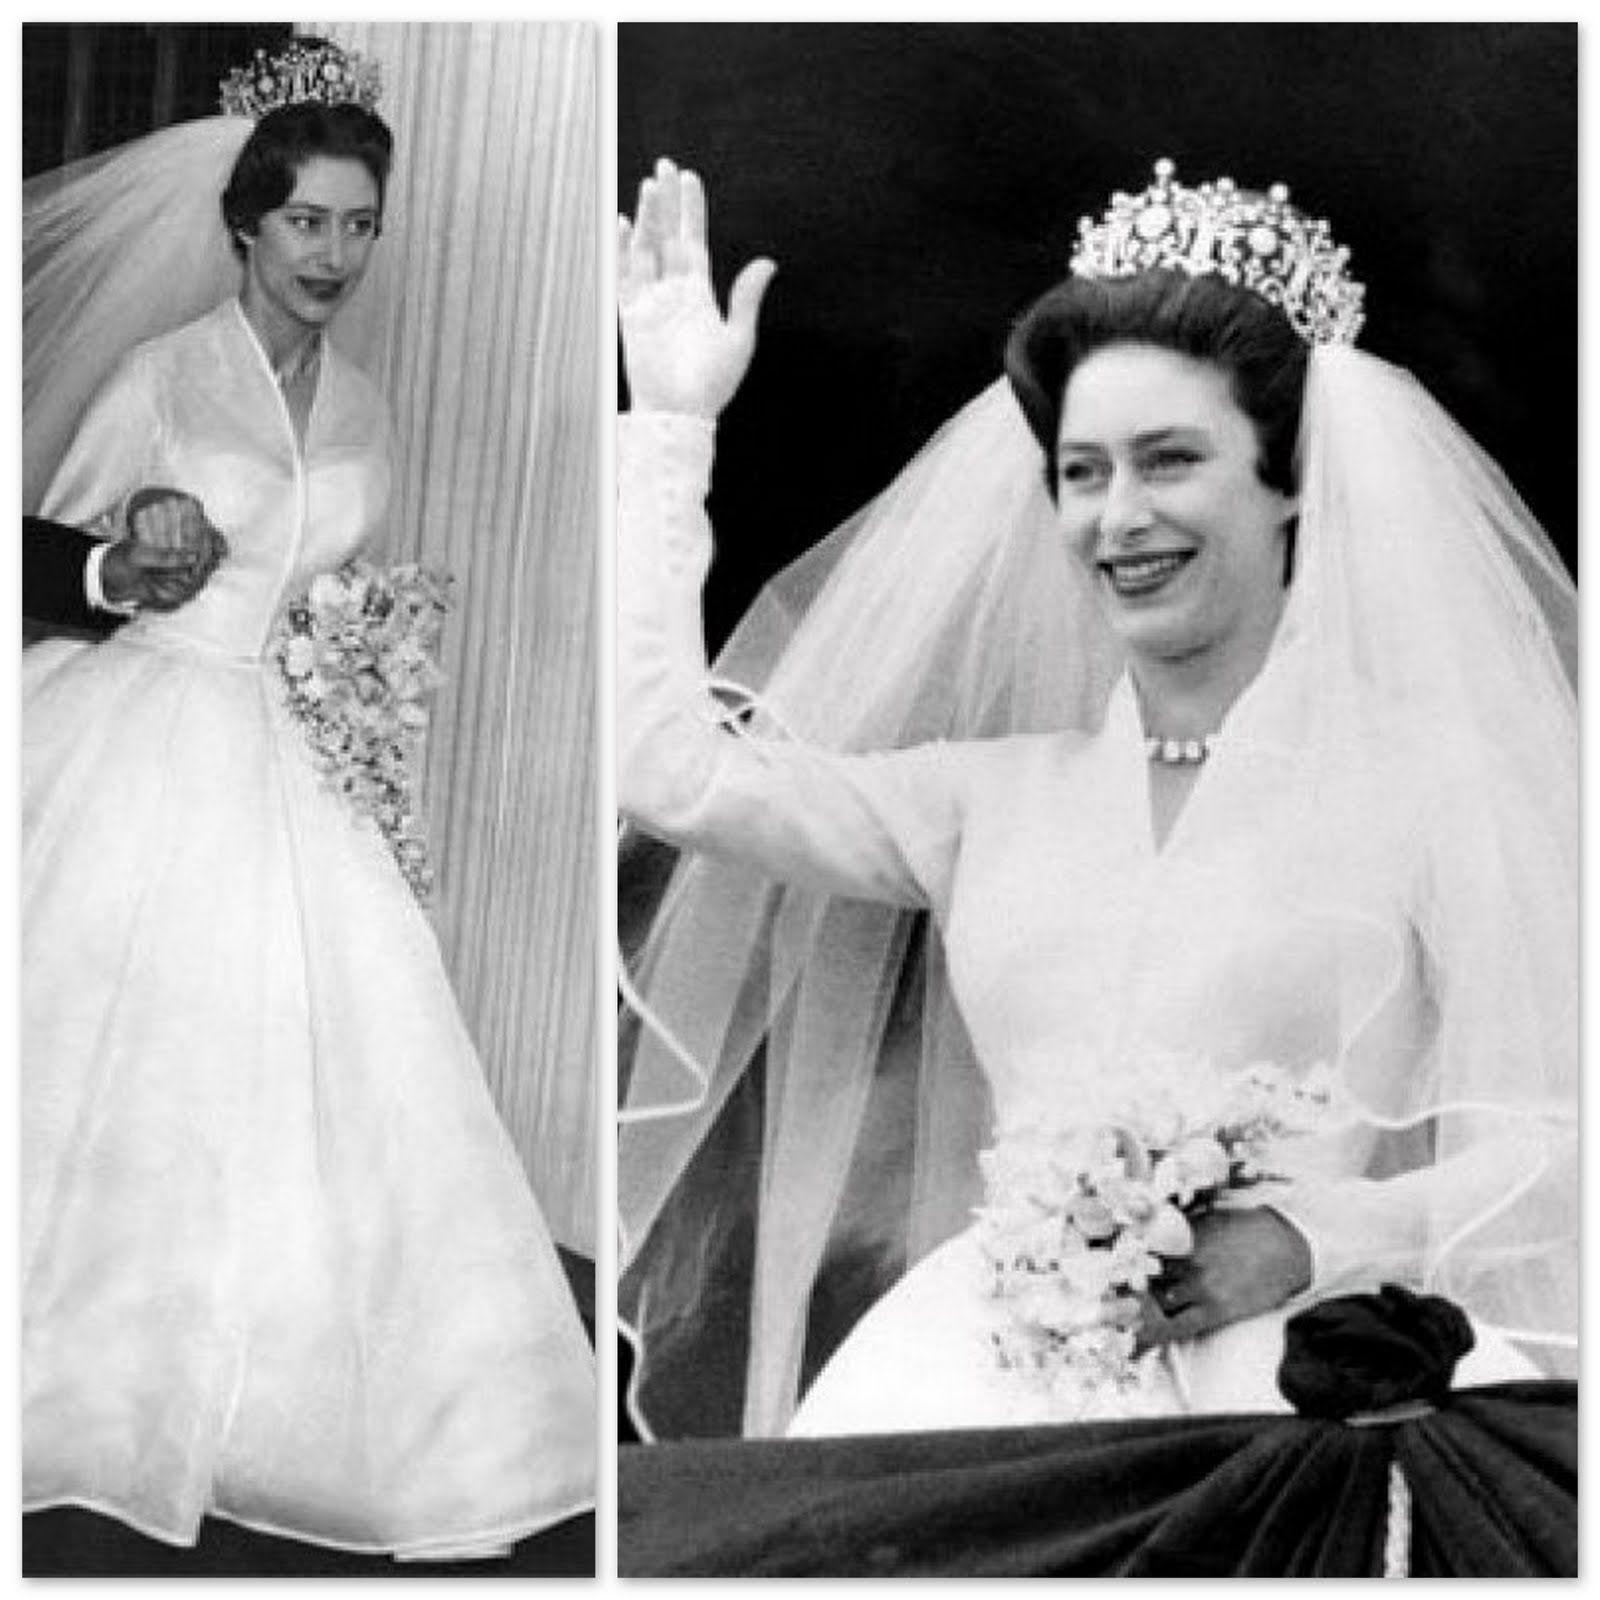 wedding 1960 princess Margaret ROYAL WEDDING Pinterest